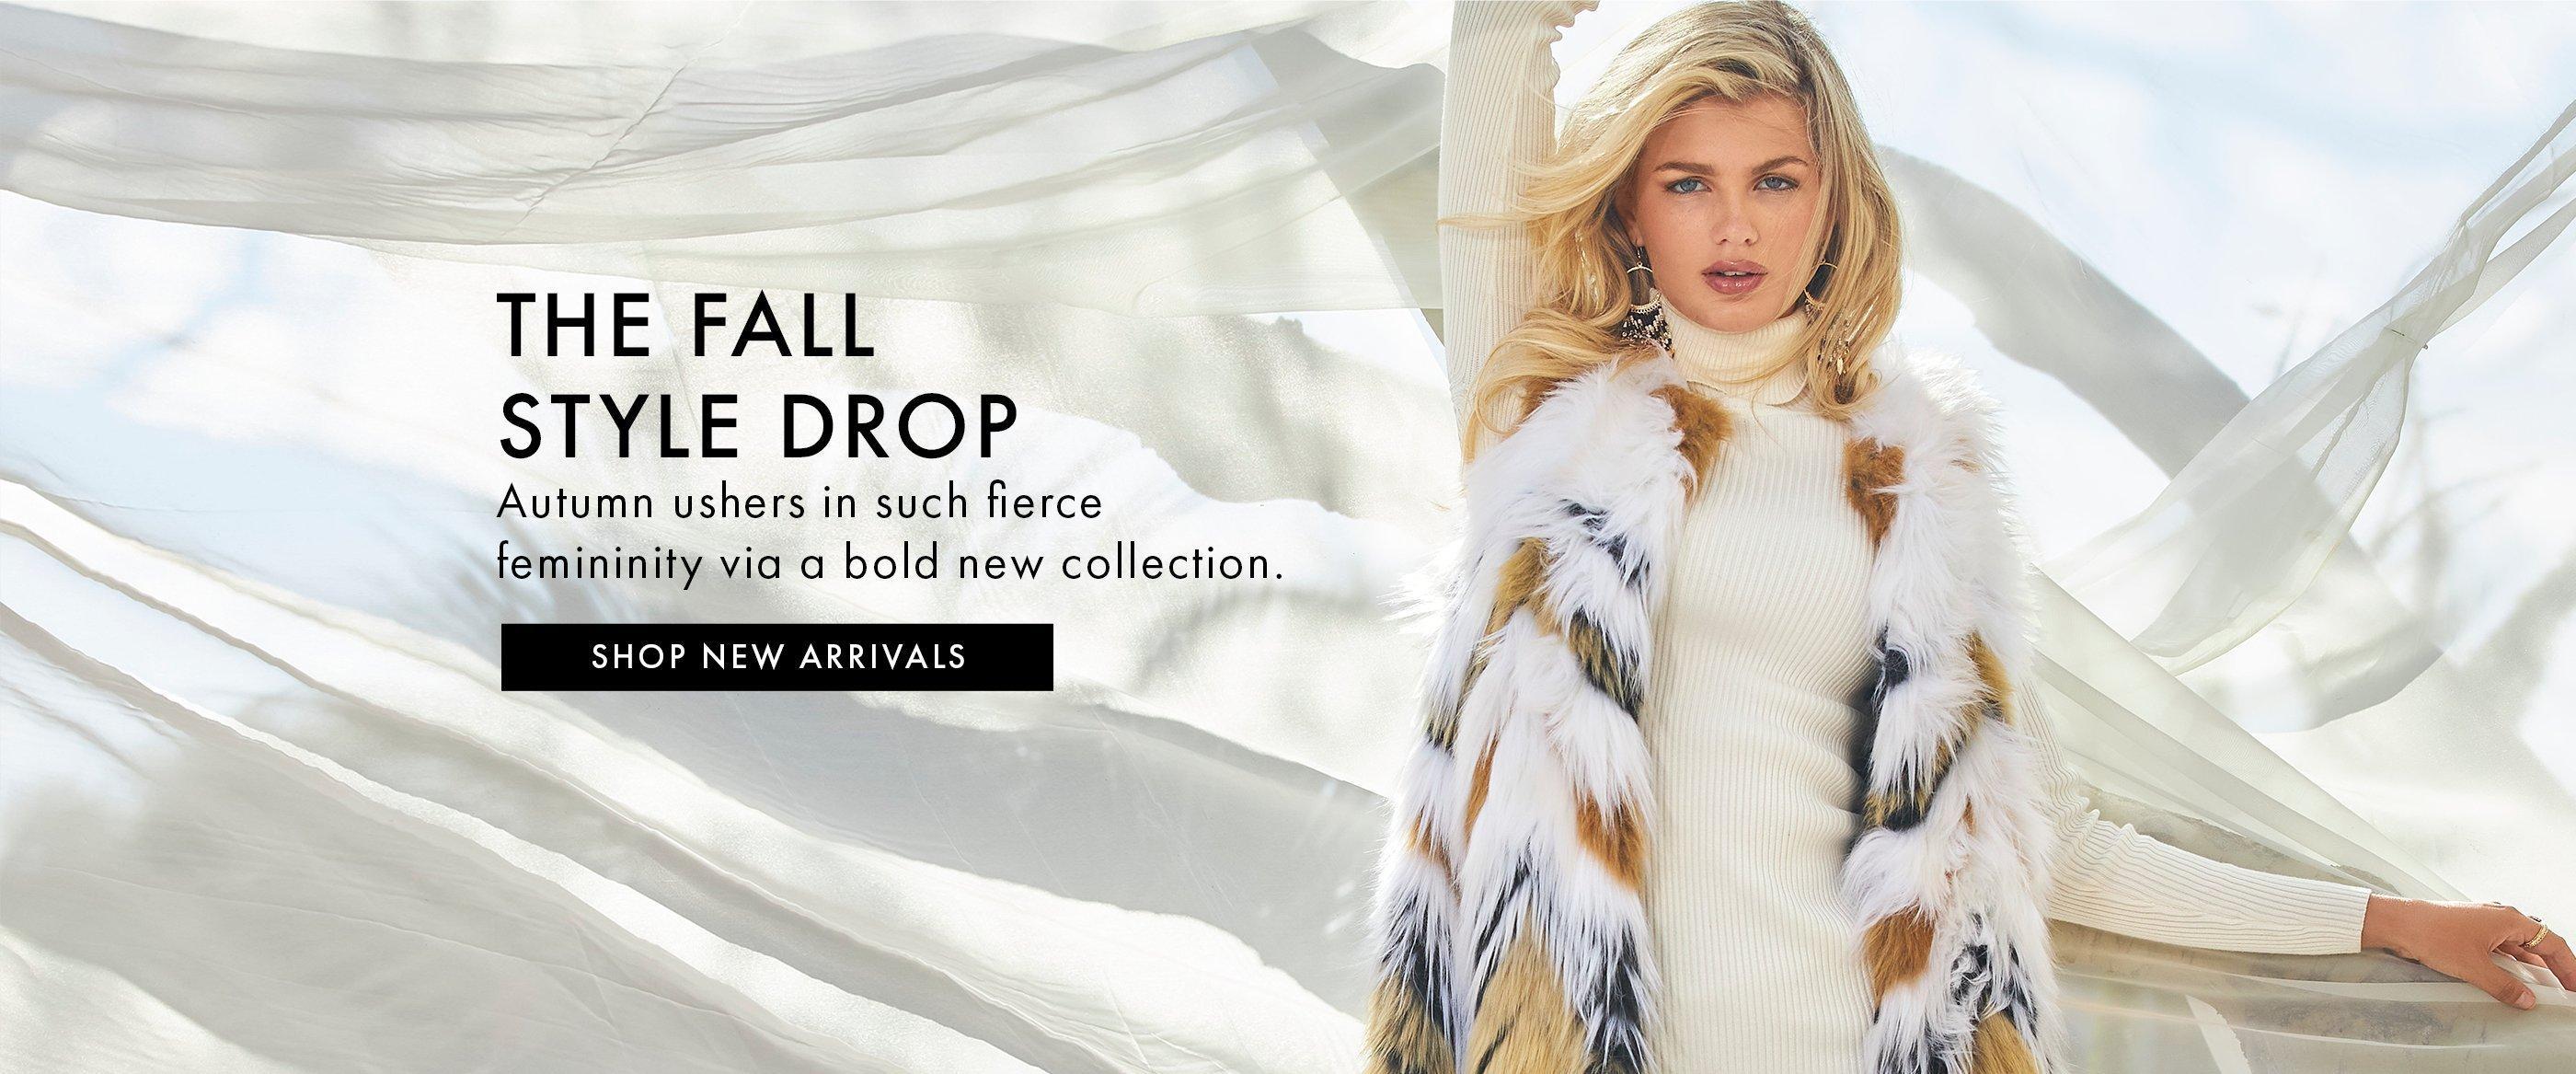 model wearing a faux fur chevron long vest and white turtleneck sweater.